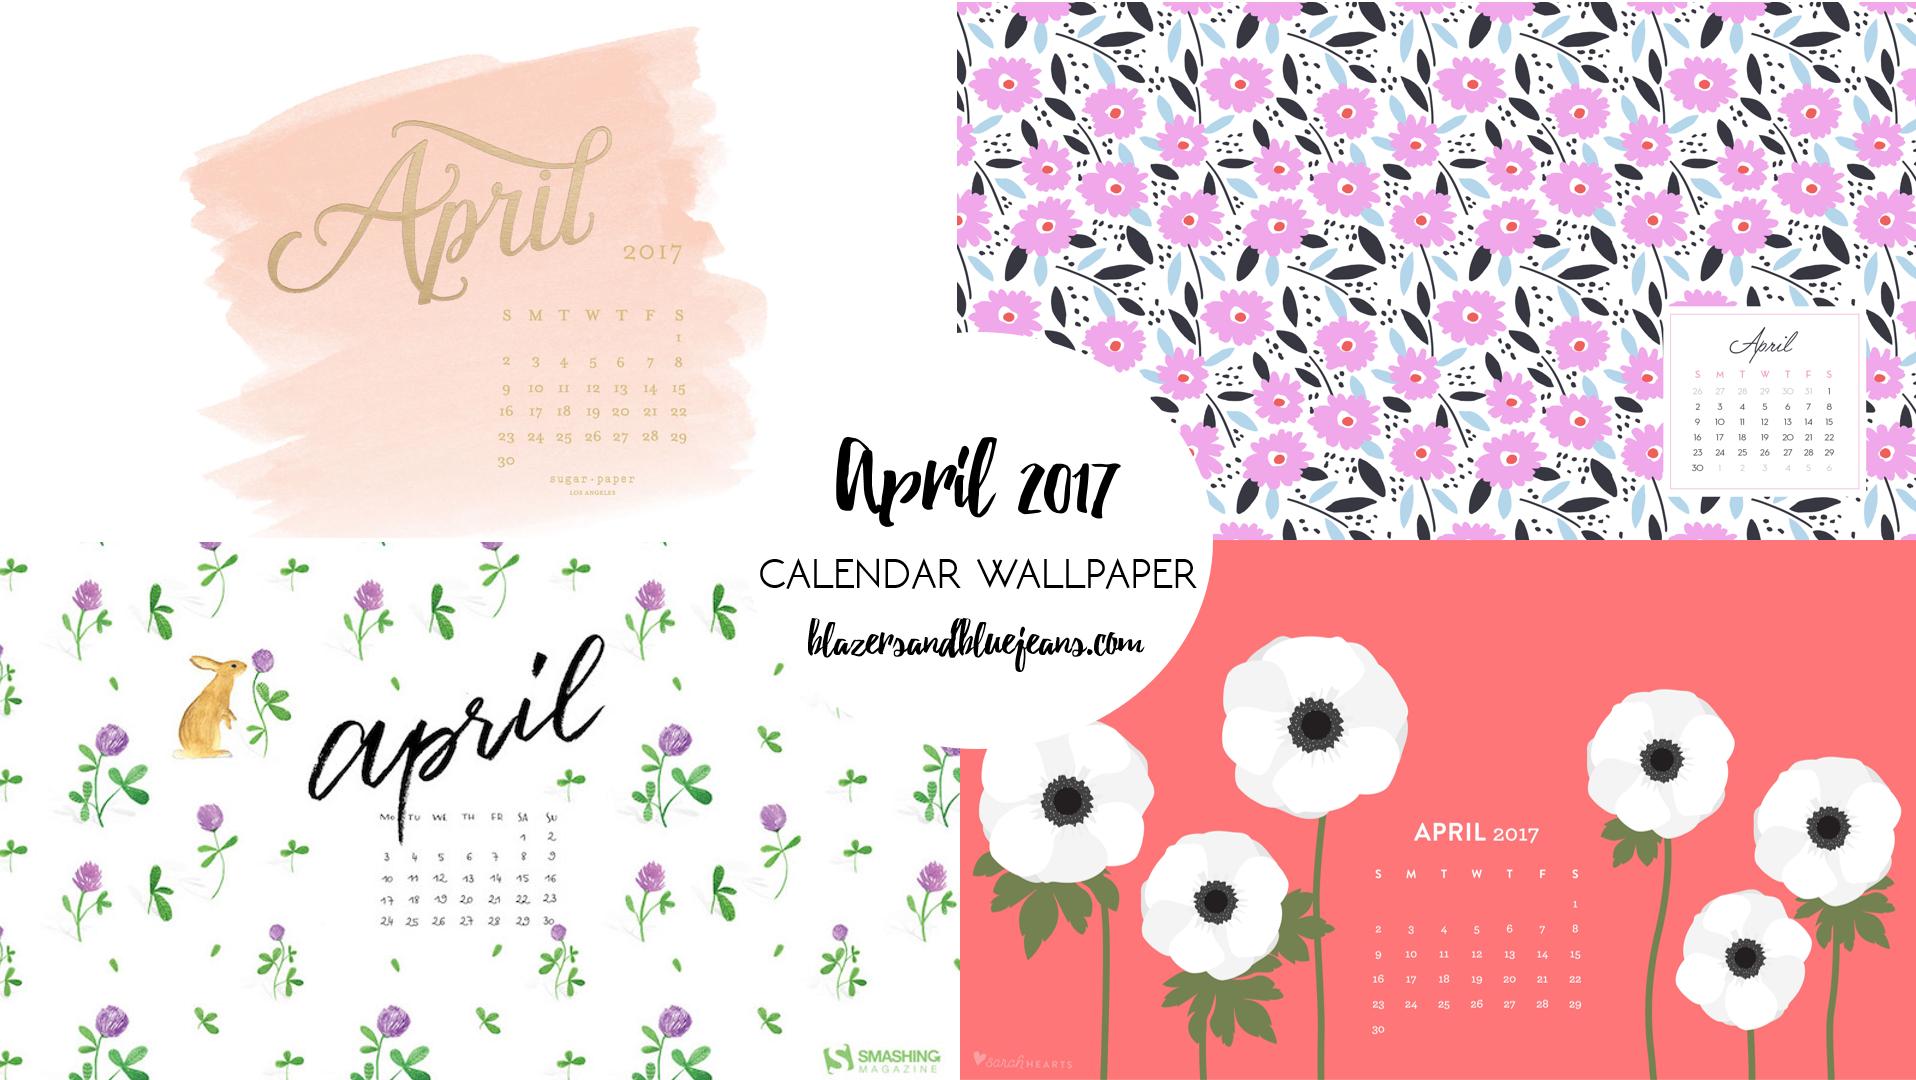 April 2017 Calendar Wallpaper   Blazers and Blue Jeans